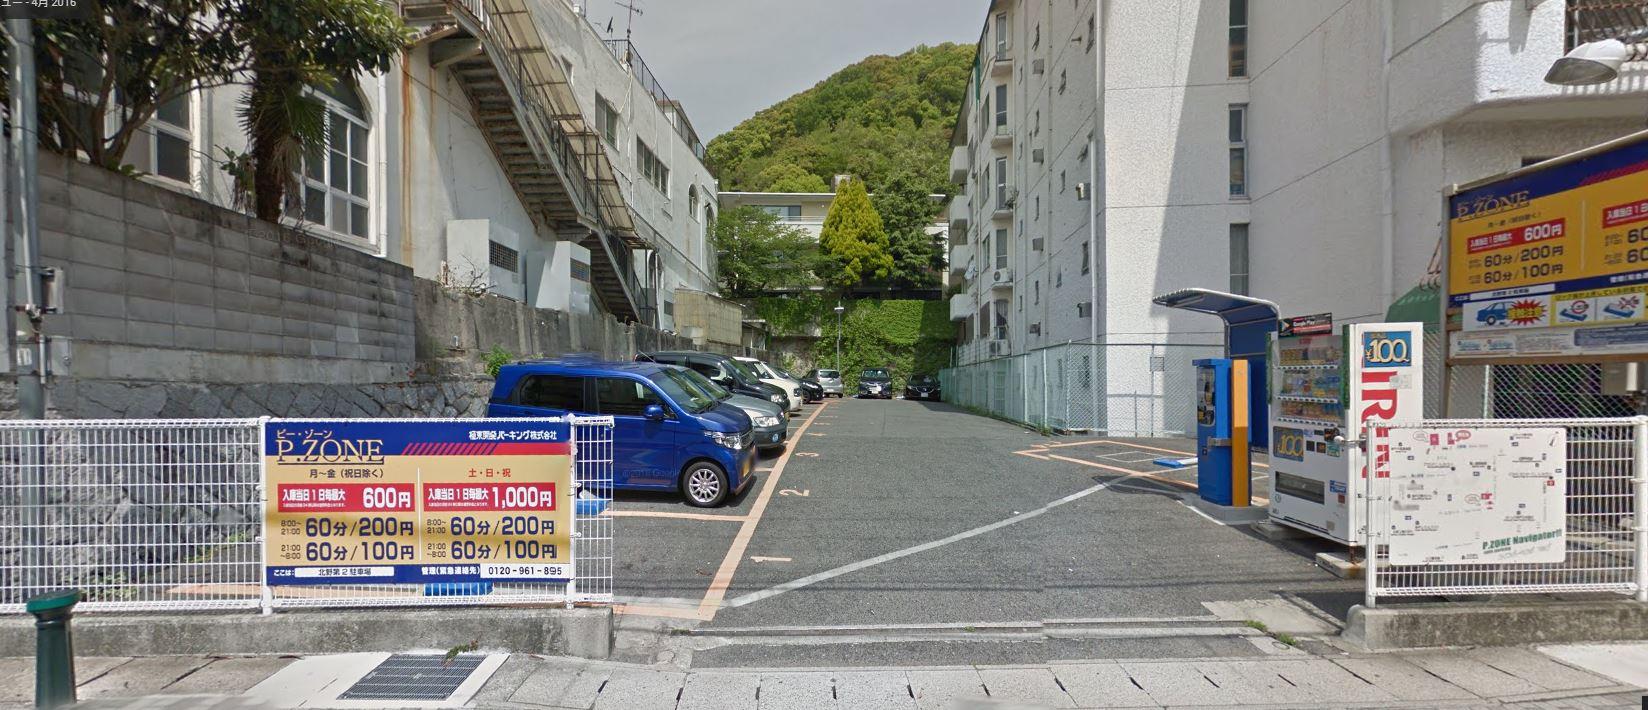 Land for sale, walking distance to Sannomiya station